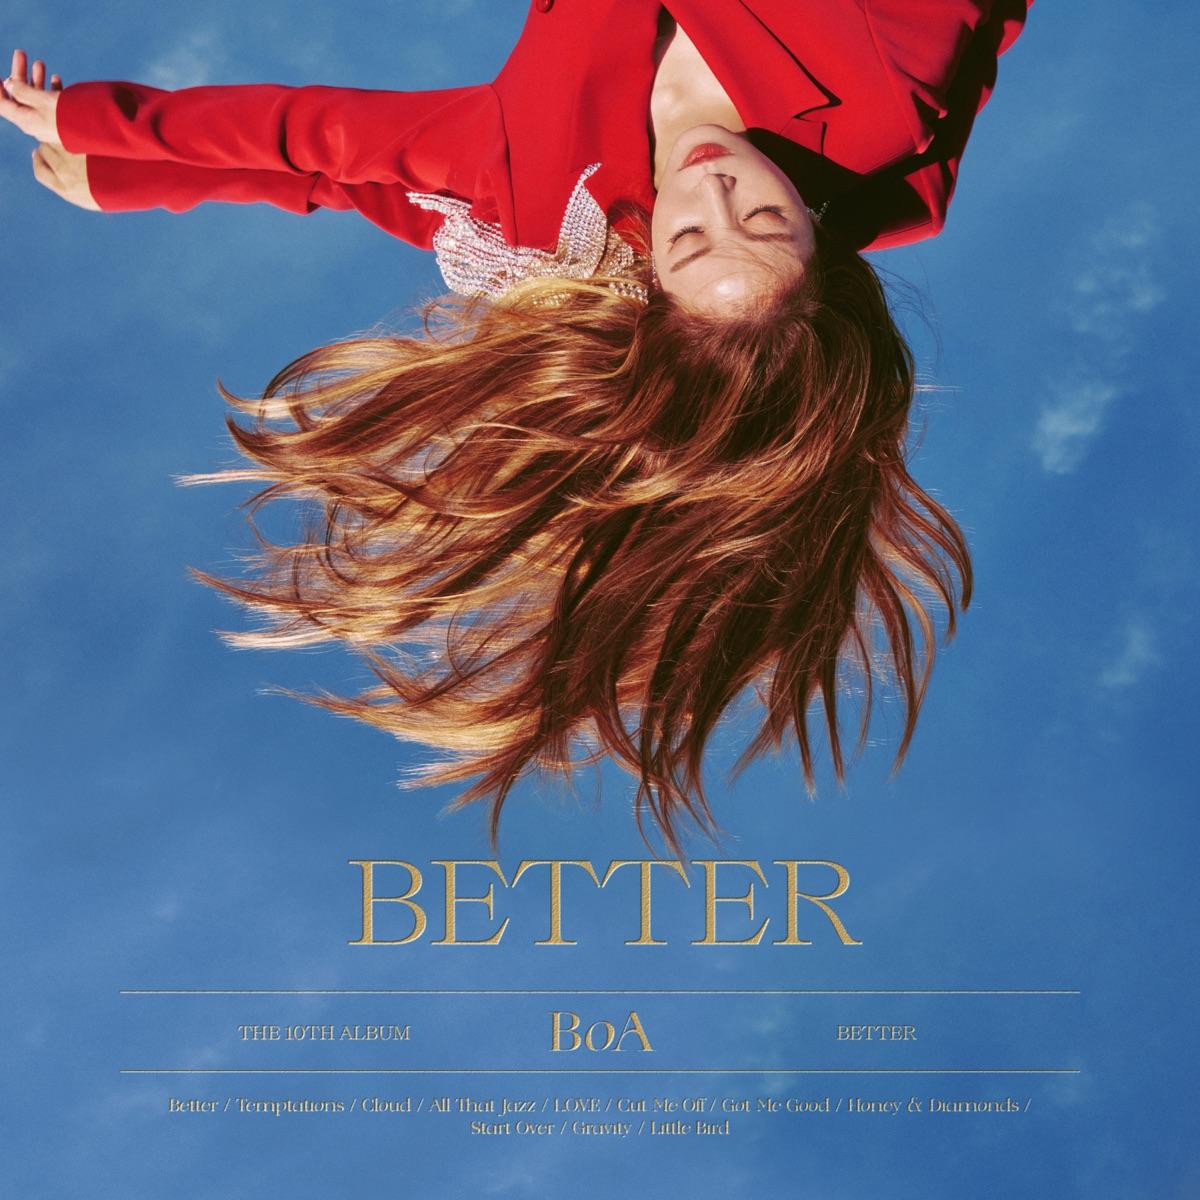 『BoA - Better 歌詞』収録の『BETTER - The 10th Album』ジャケット